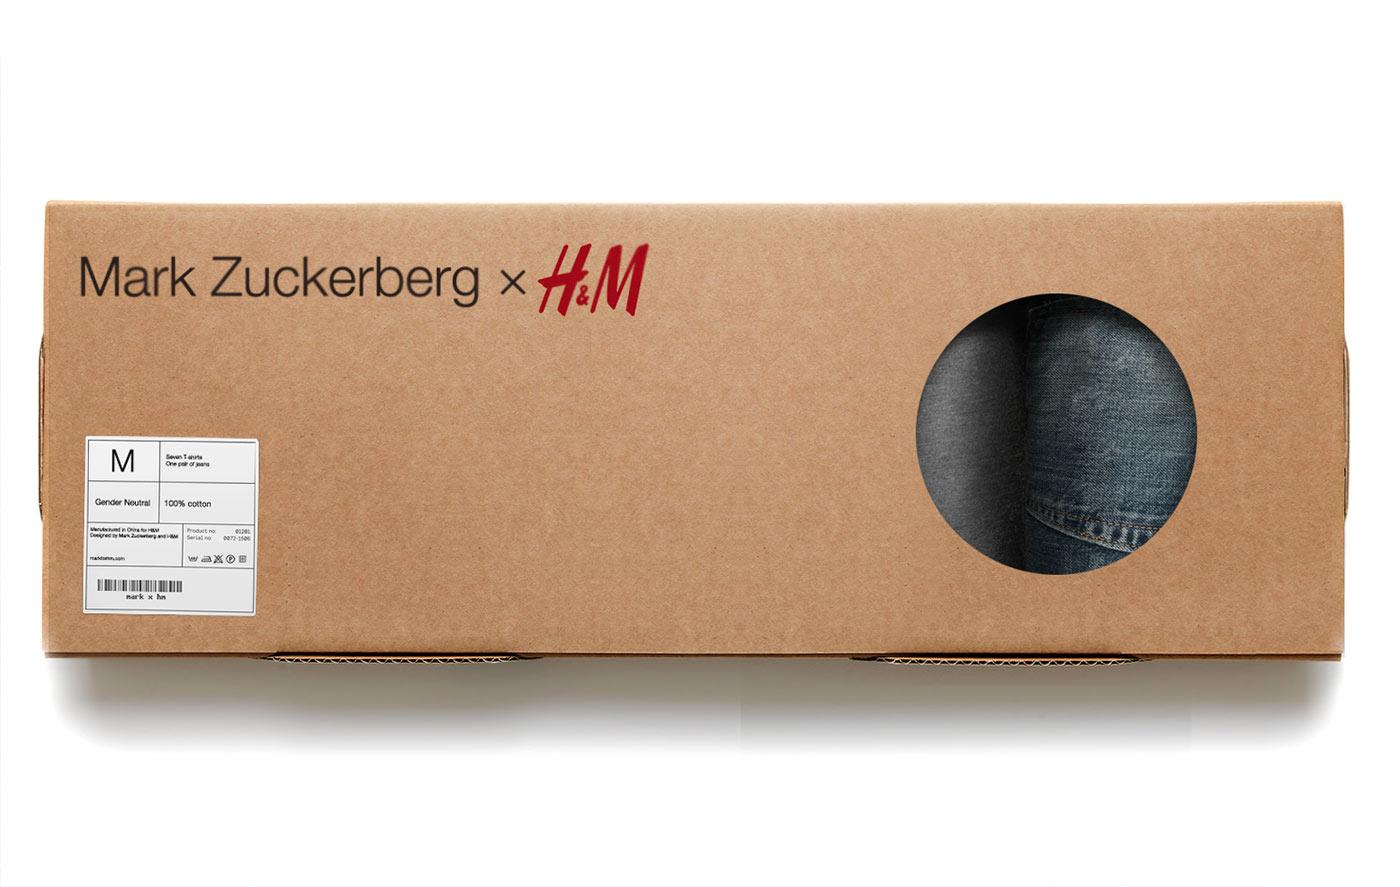 mark zuckerberg per HM pack